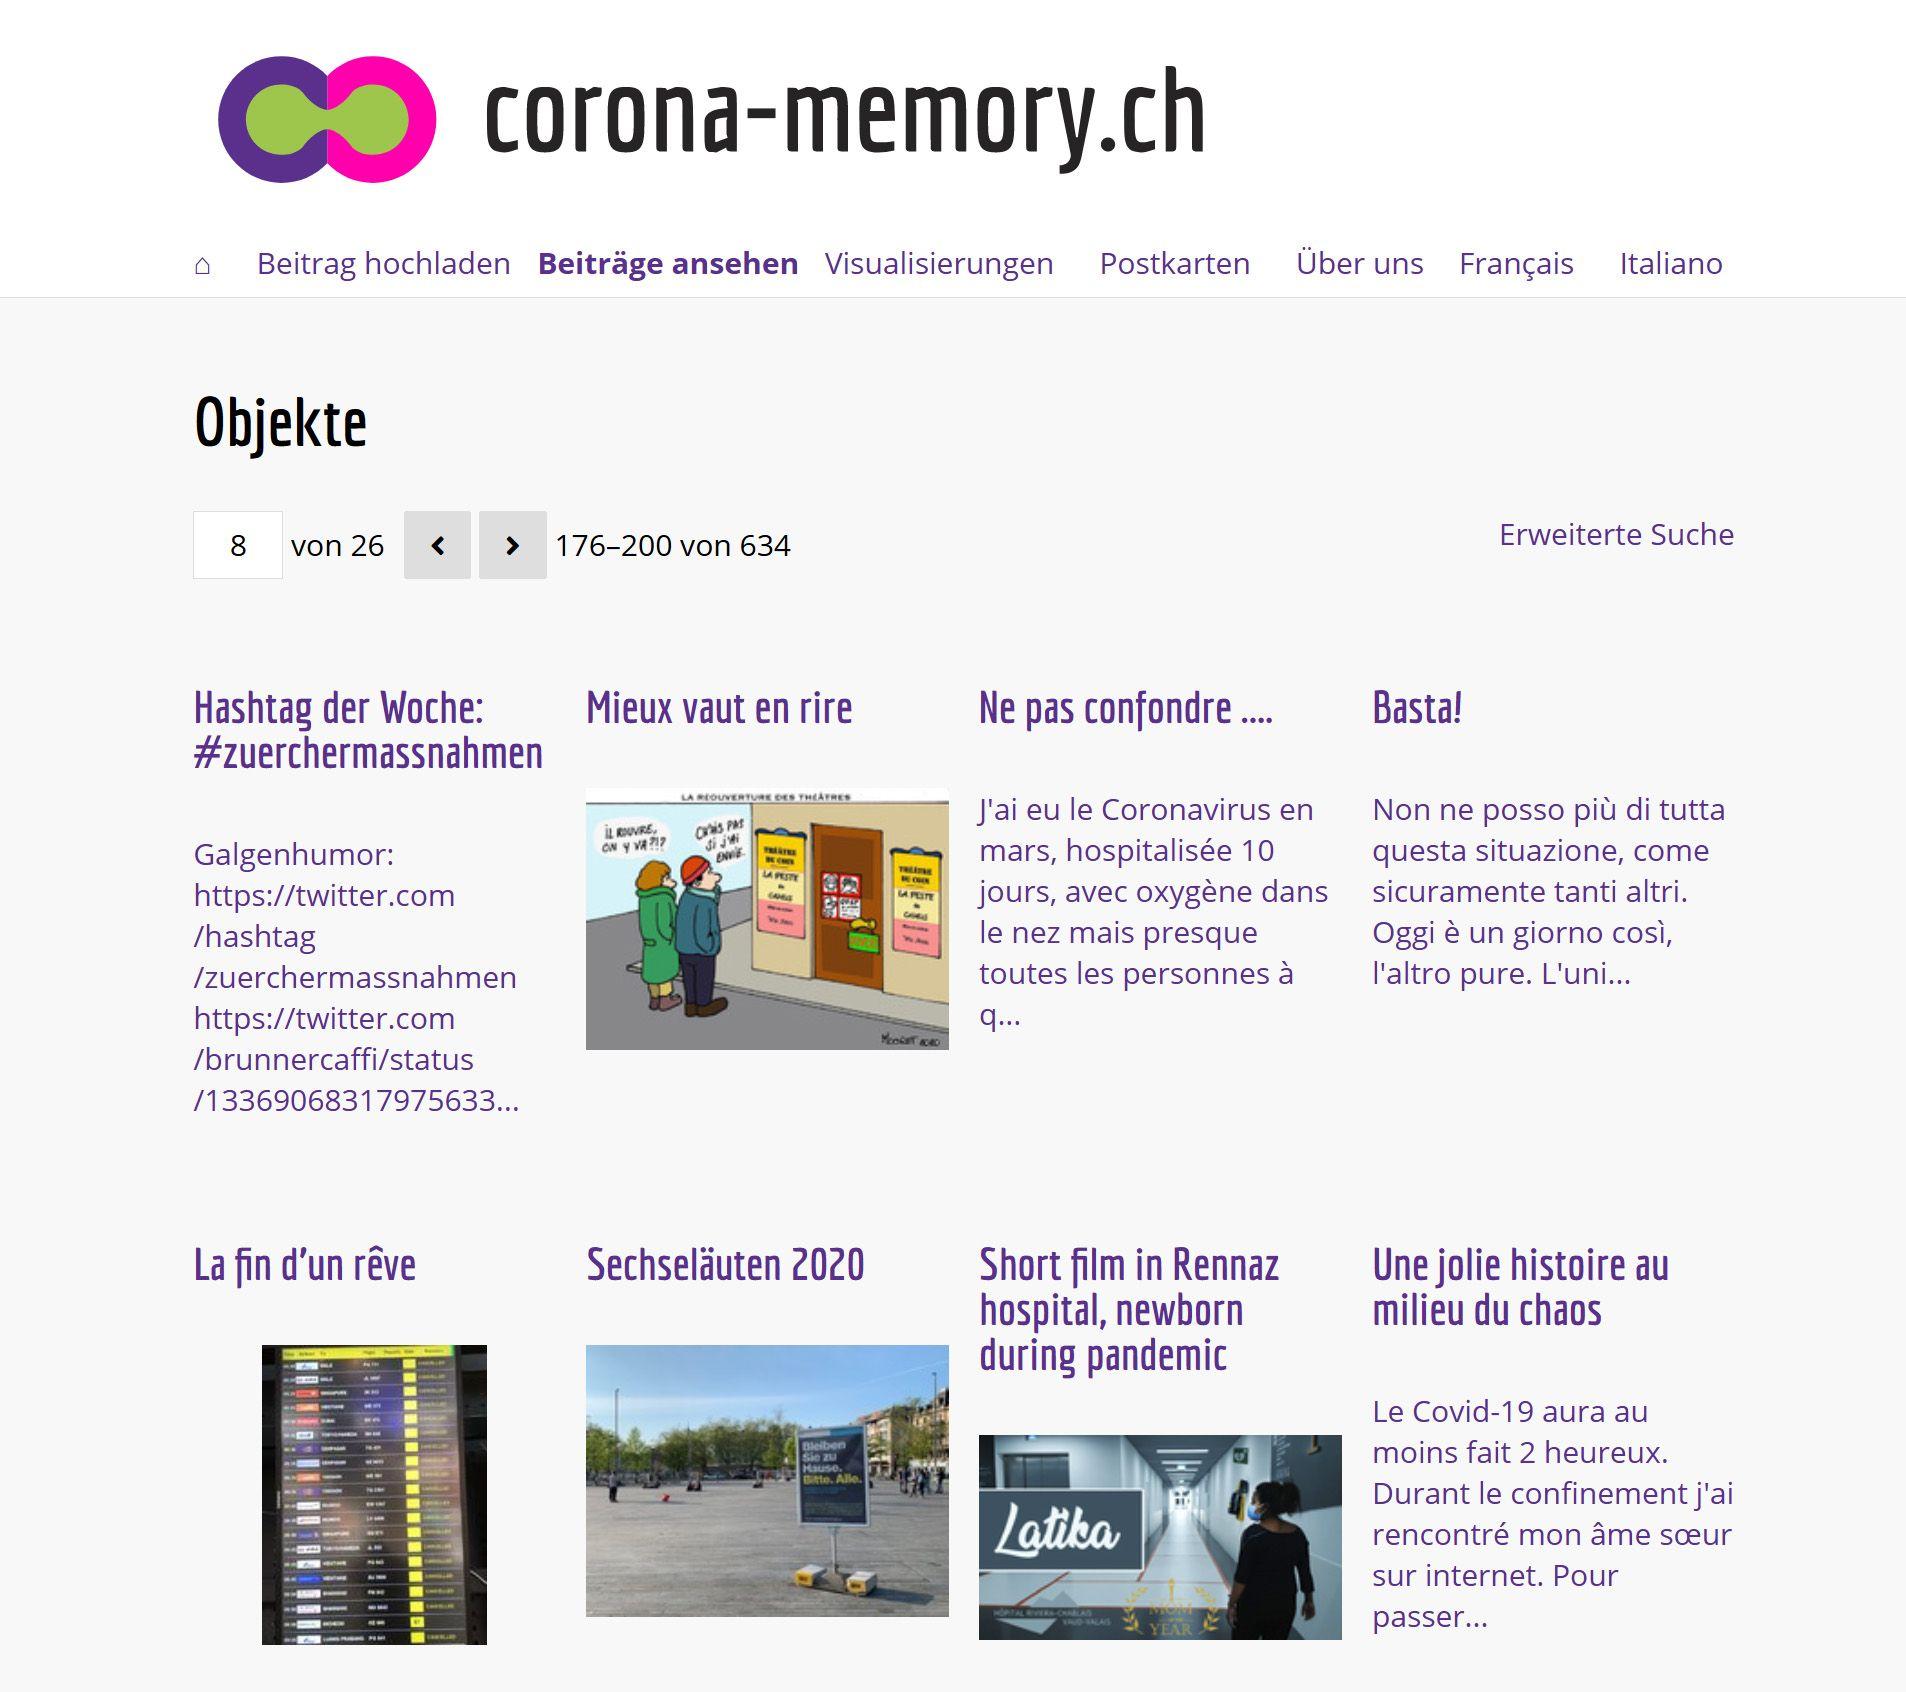 CoronaMemory_Objekte.jpg